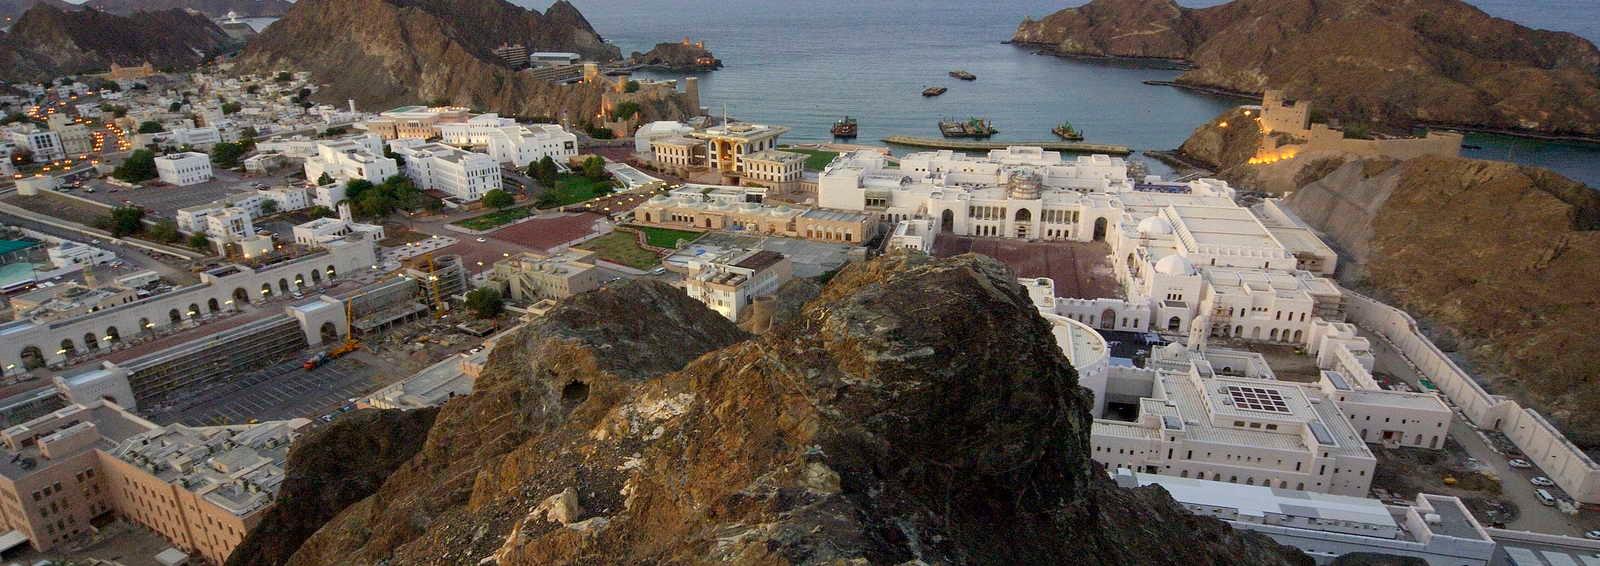 Old Palace Muscat, Oman